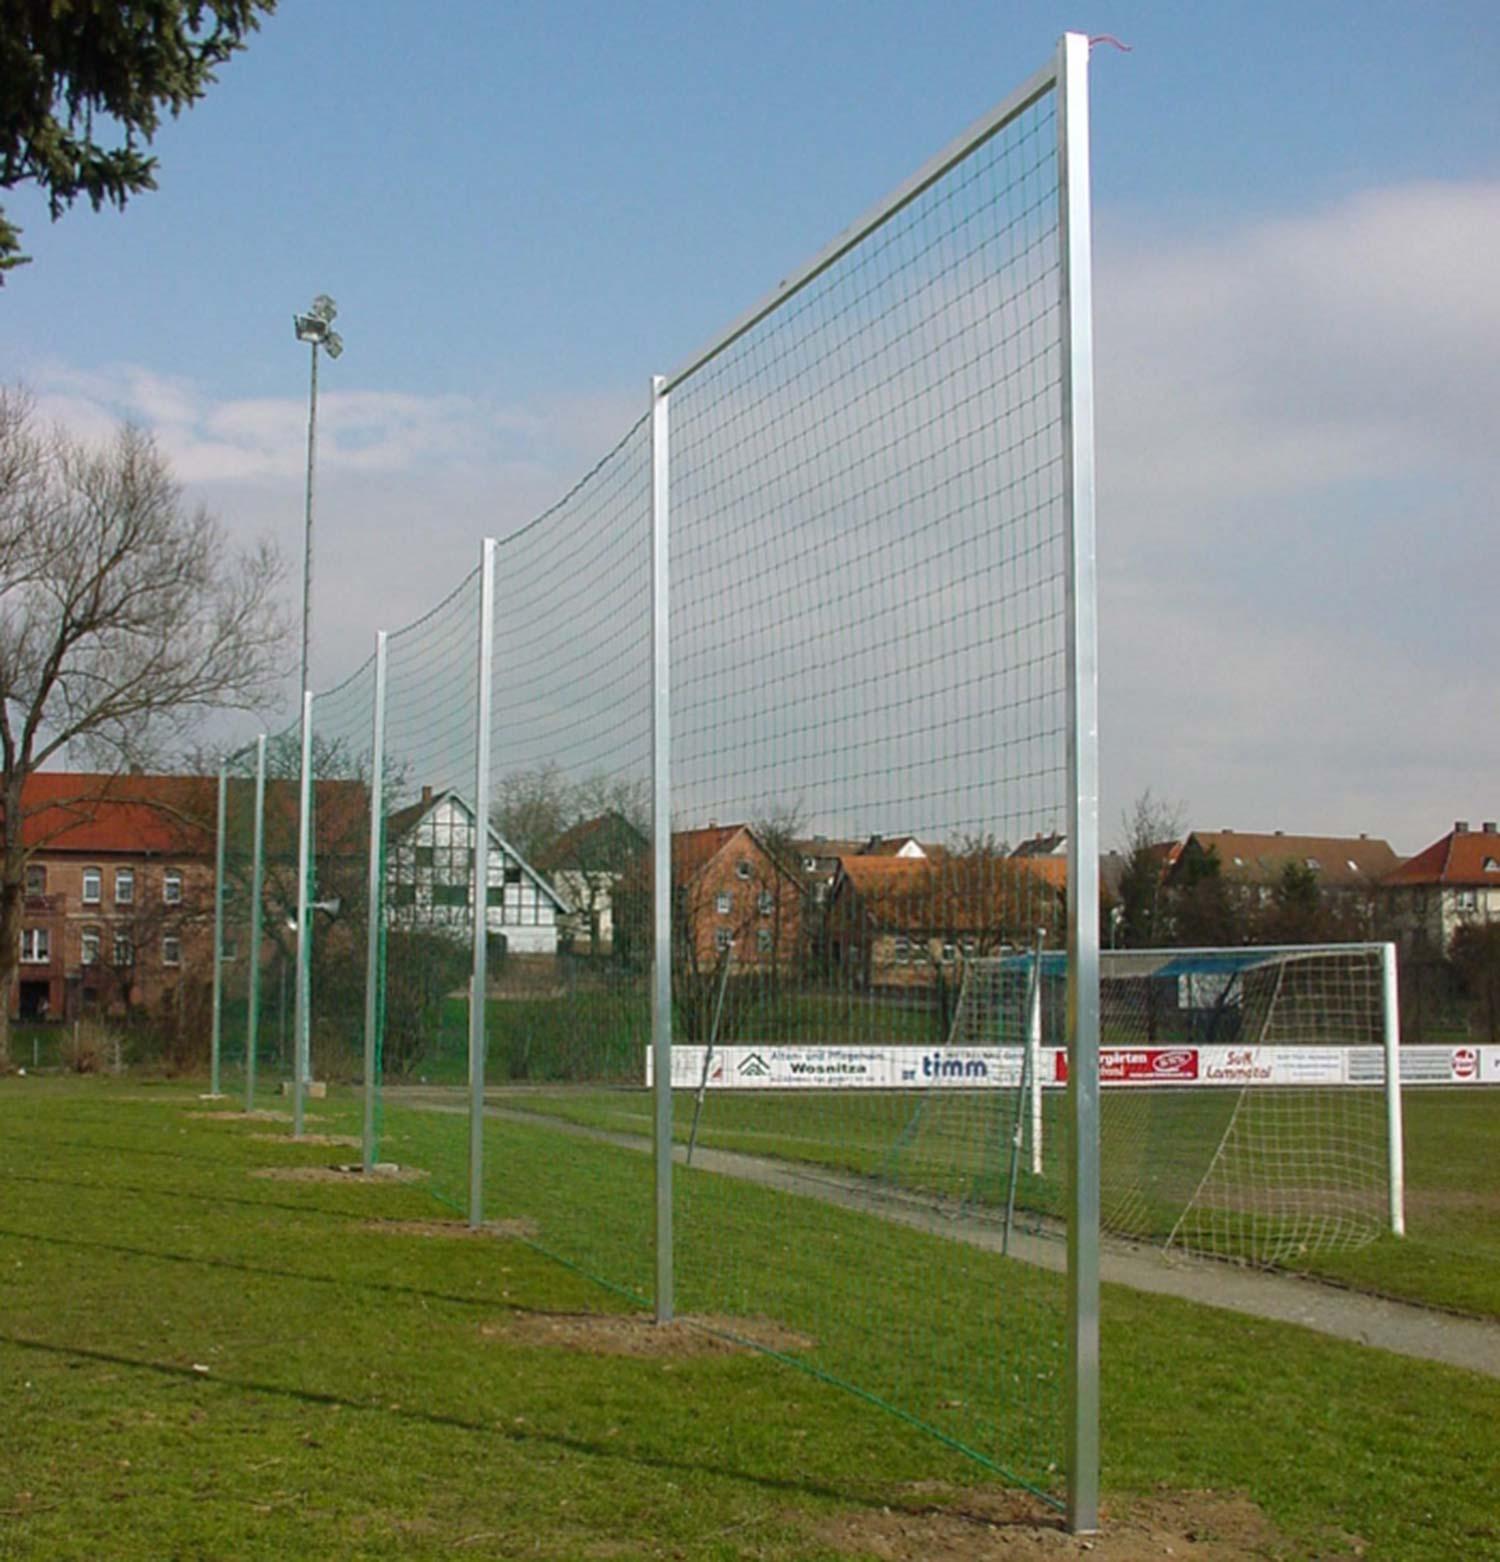 Ballfangpfosten 5 m